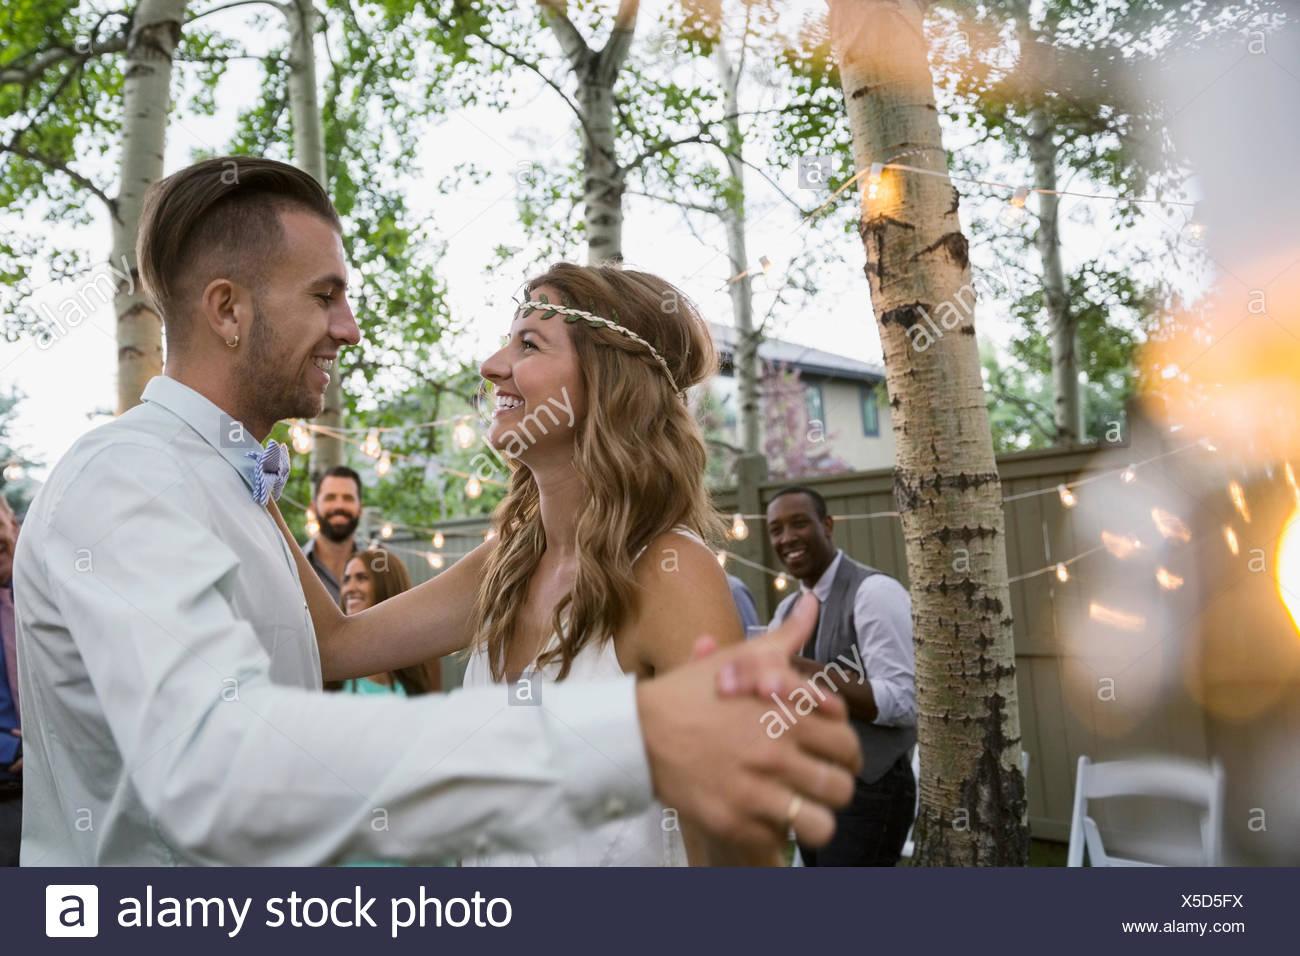 Bride and groom dancing at backyard wedding reception - Stock Image